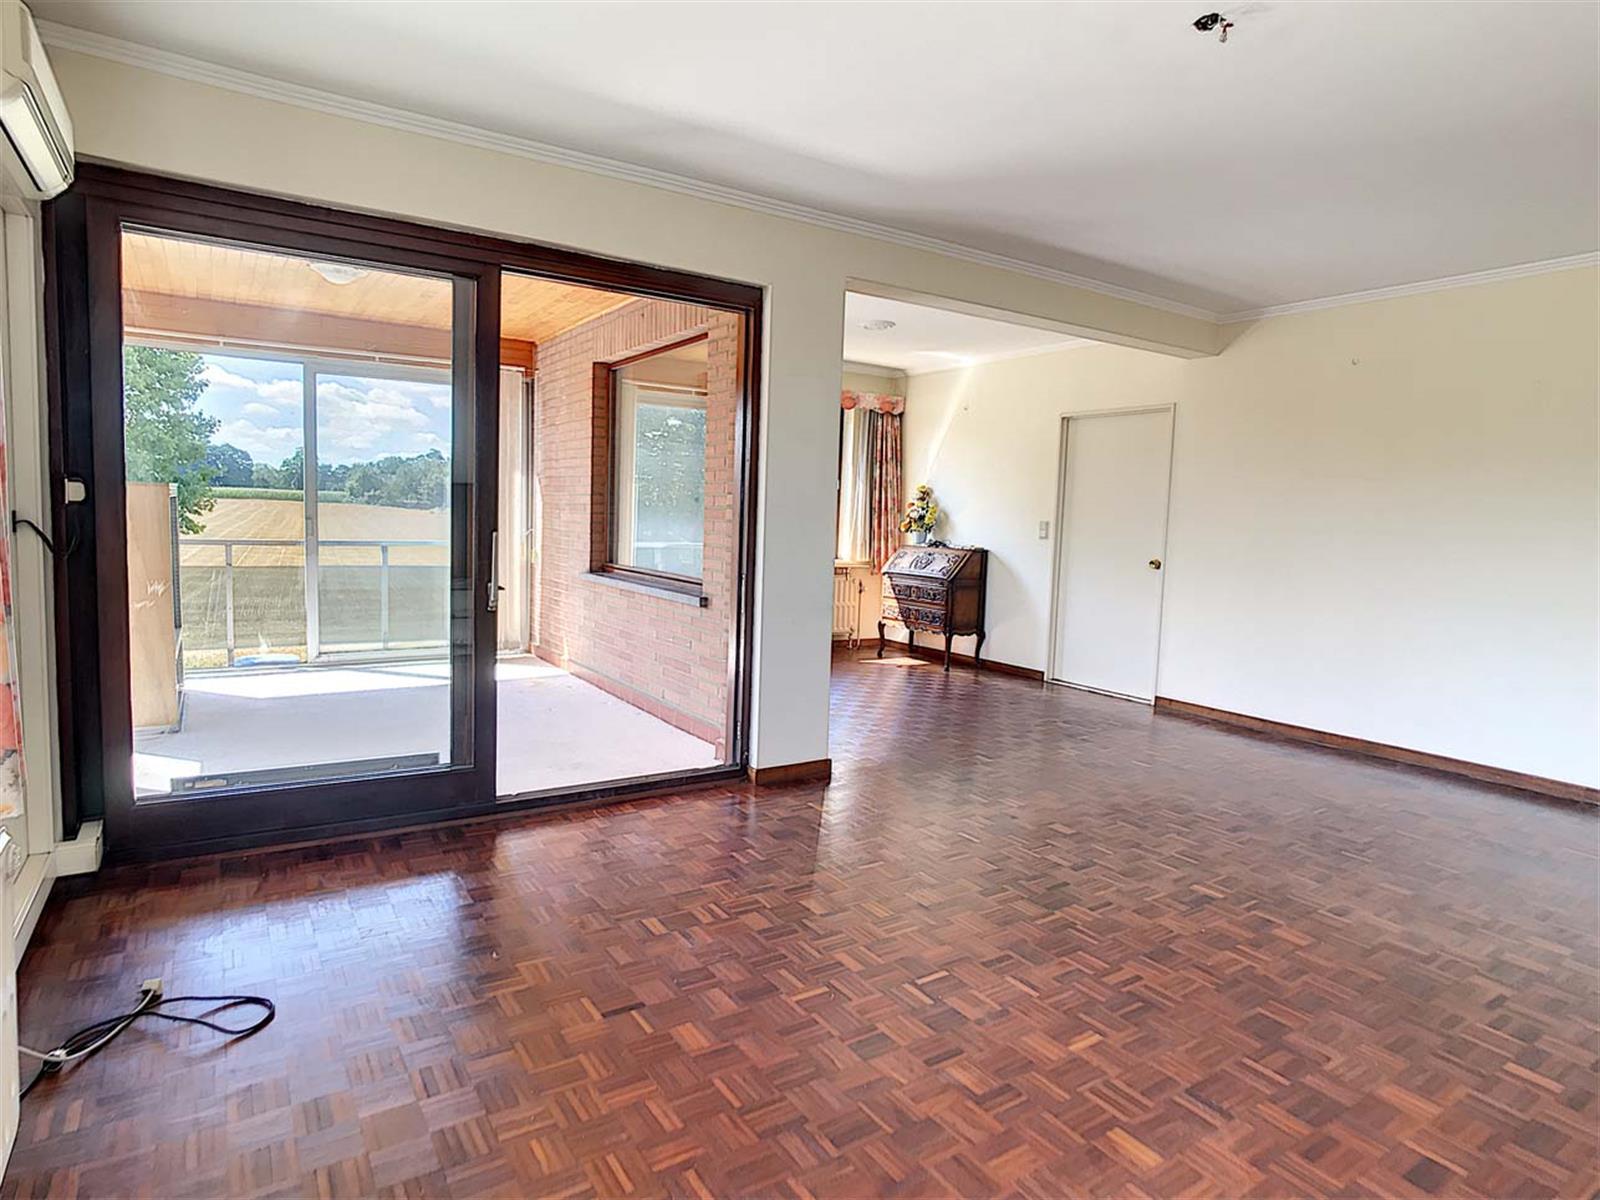 Appartement - Kraainem - #4162574-0